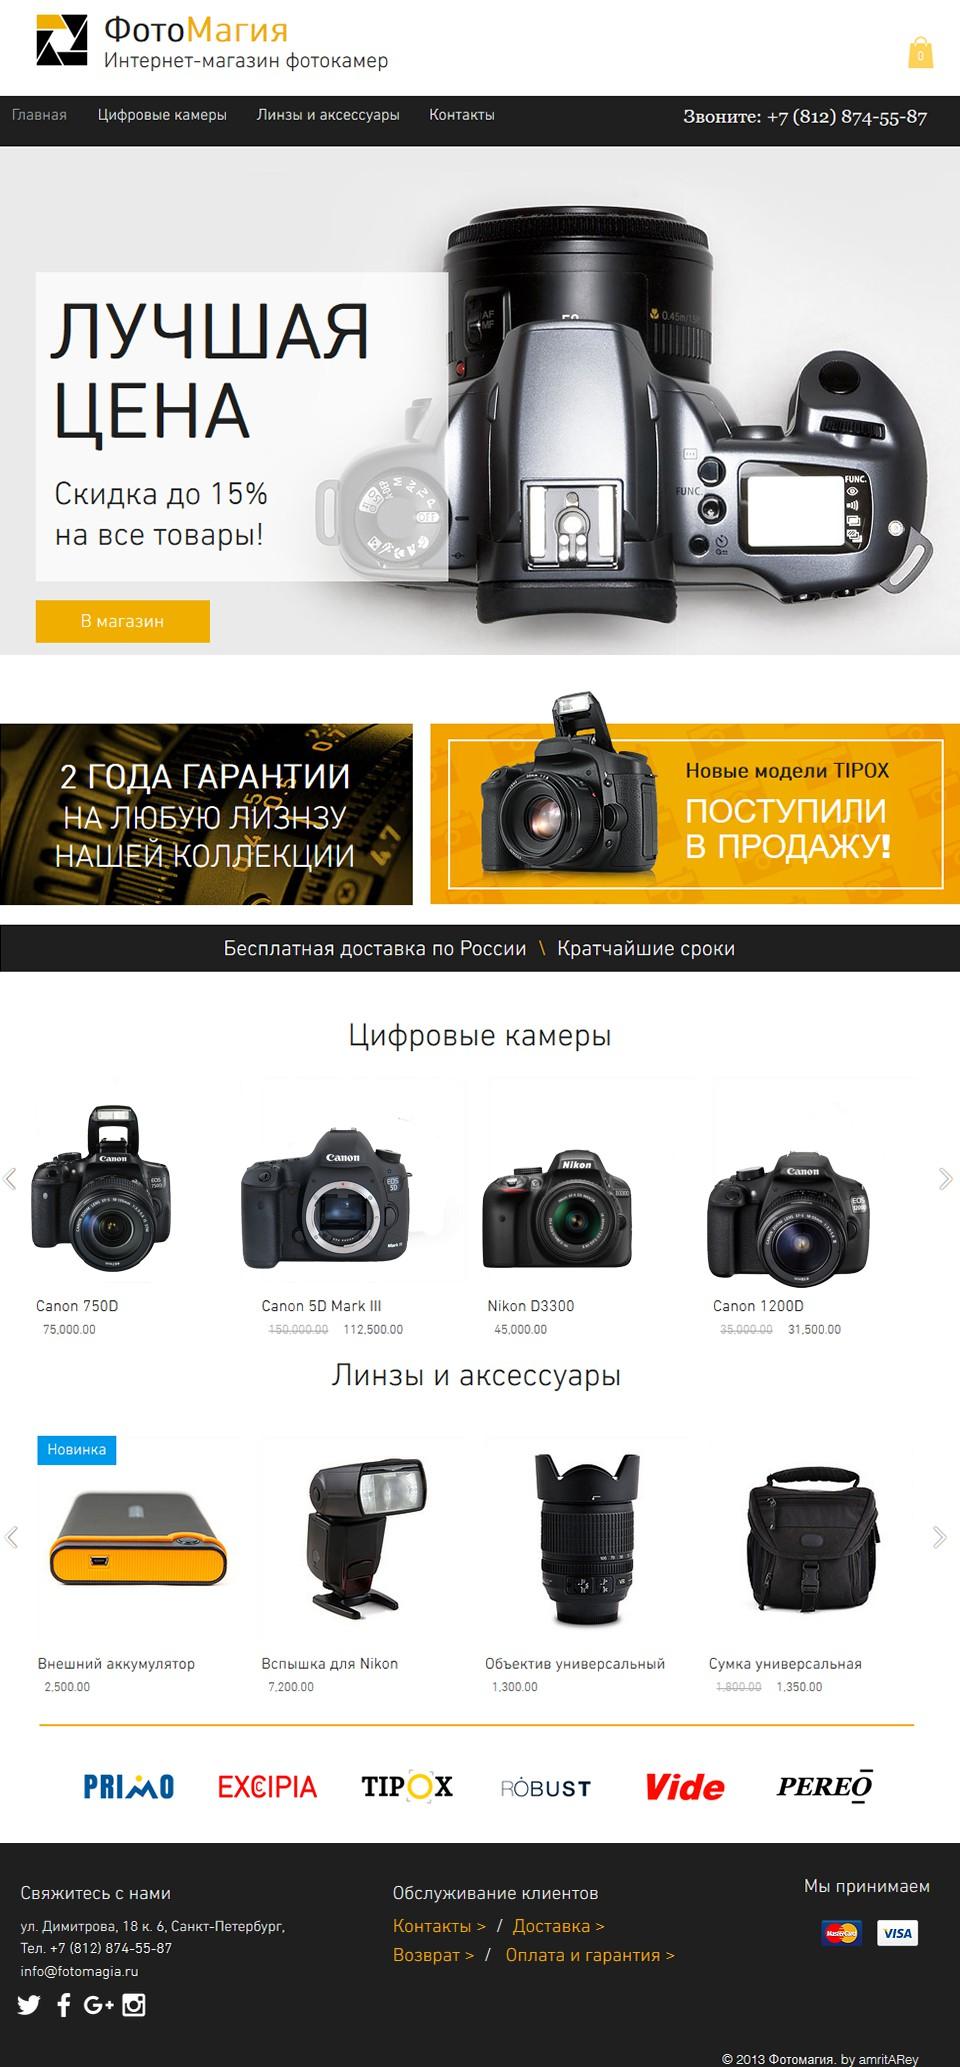 Интернет магазин фототехники москва